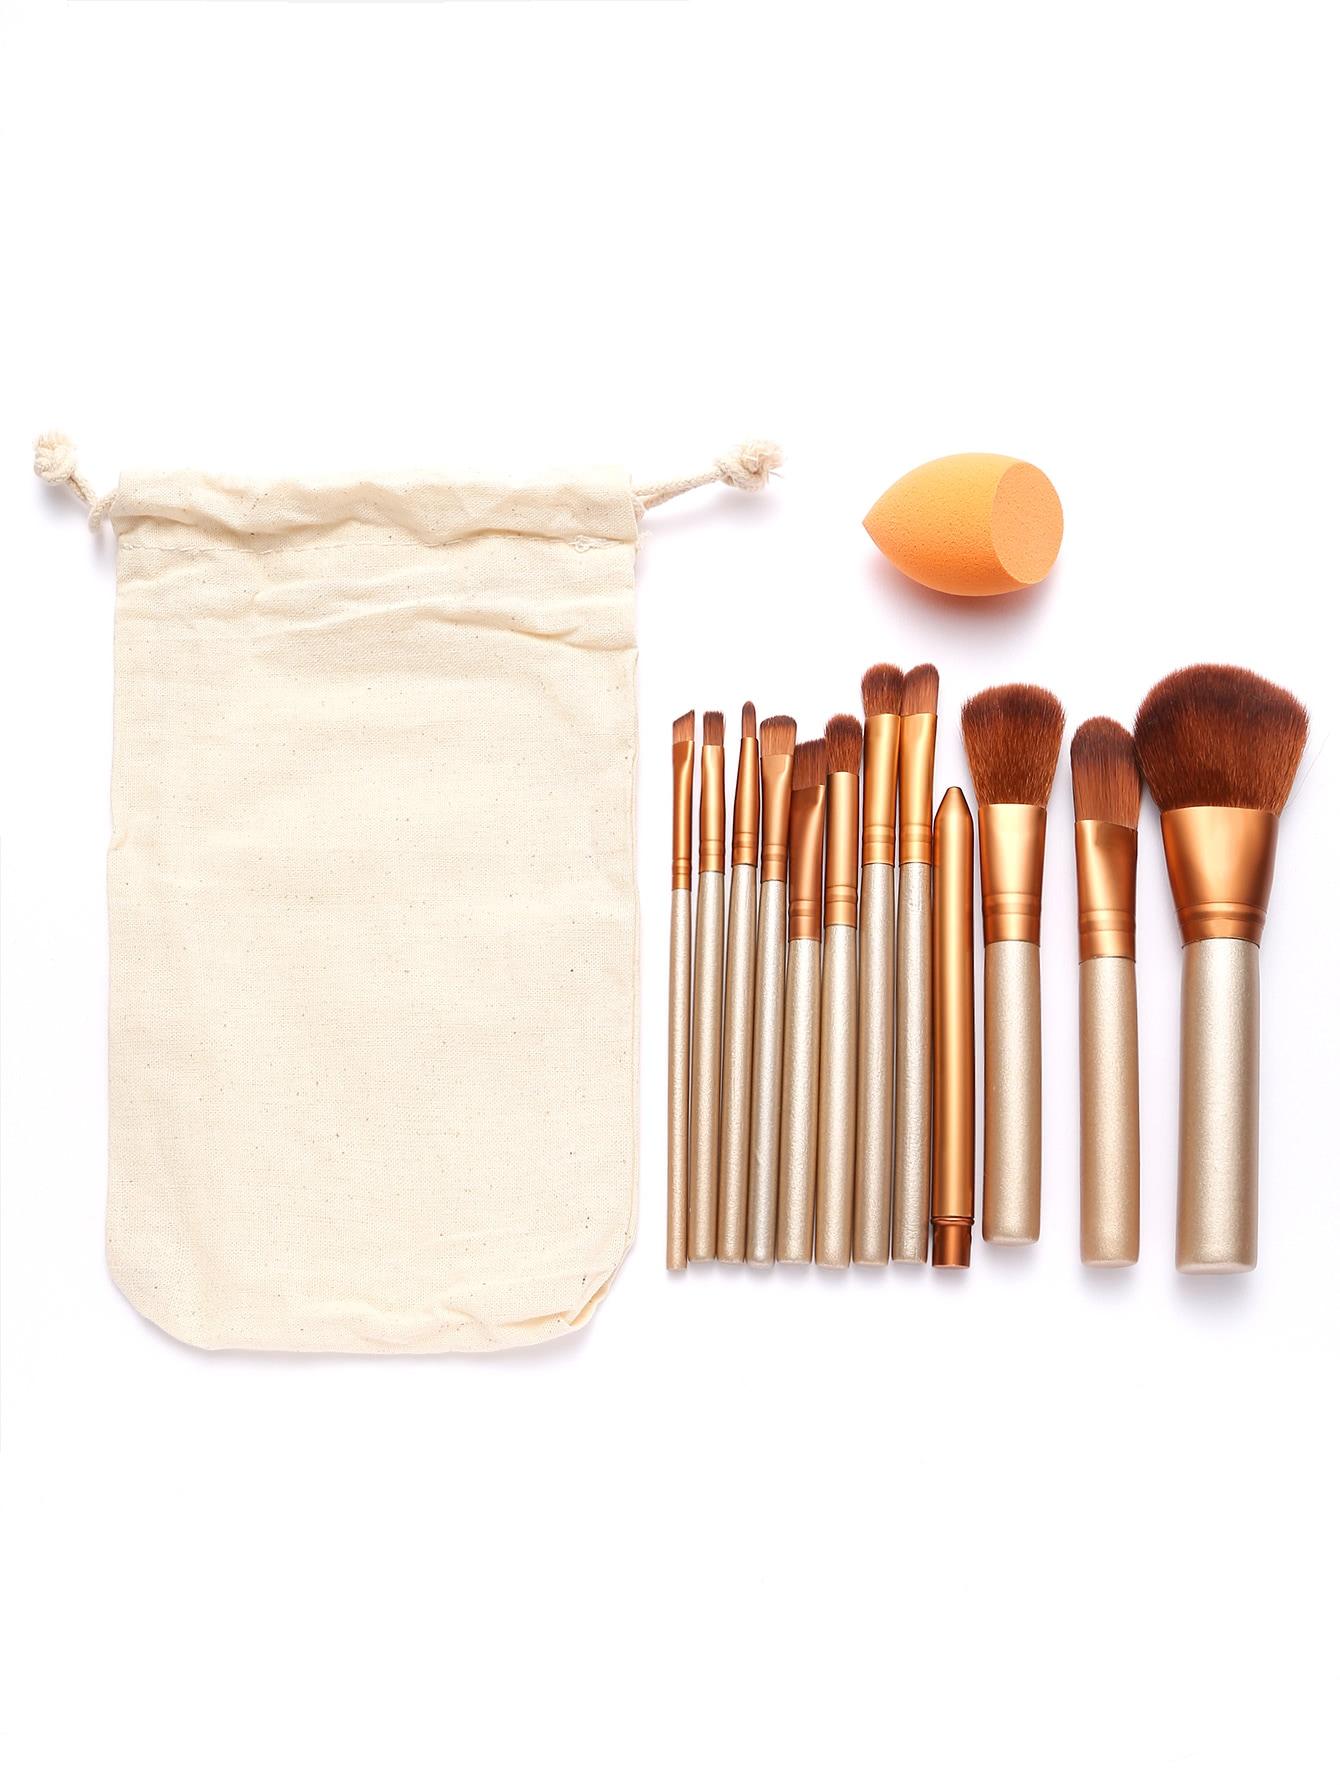 Image of 12Pcs Gold Professional Makeup Brush Set with Canvas Bag